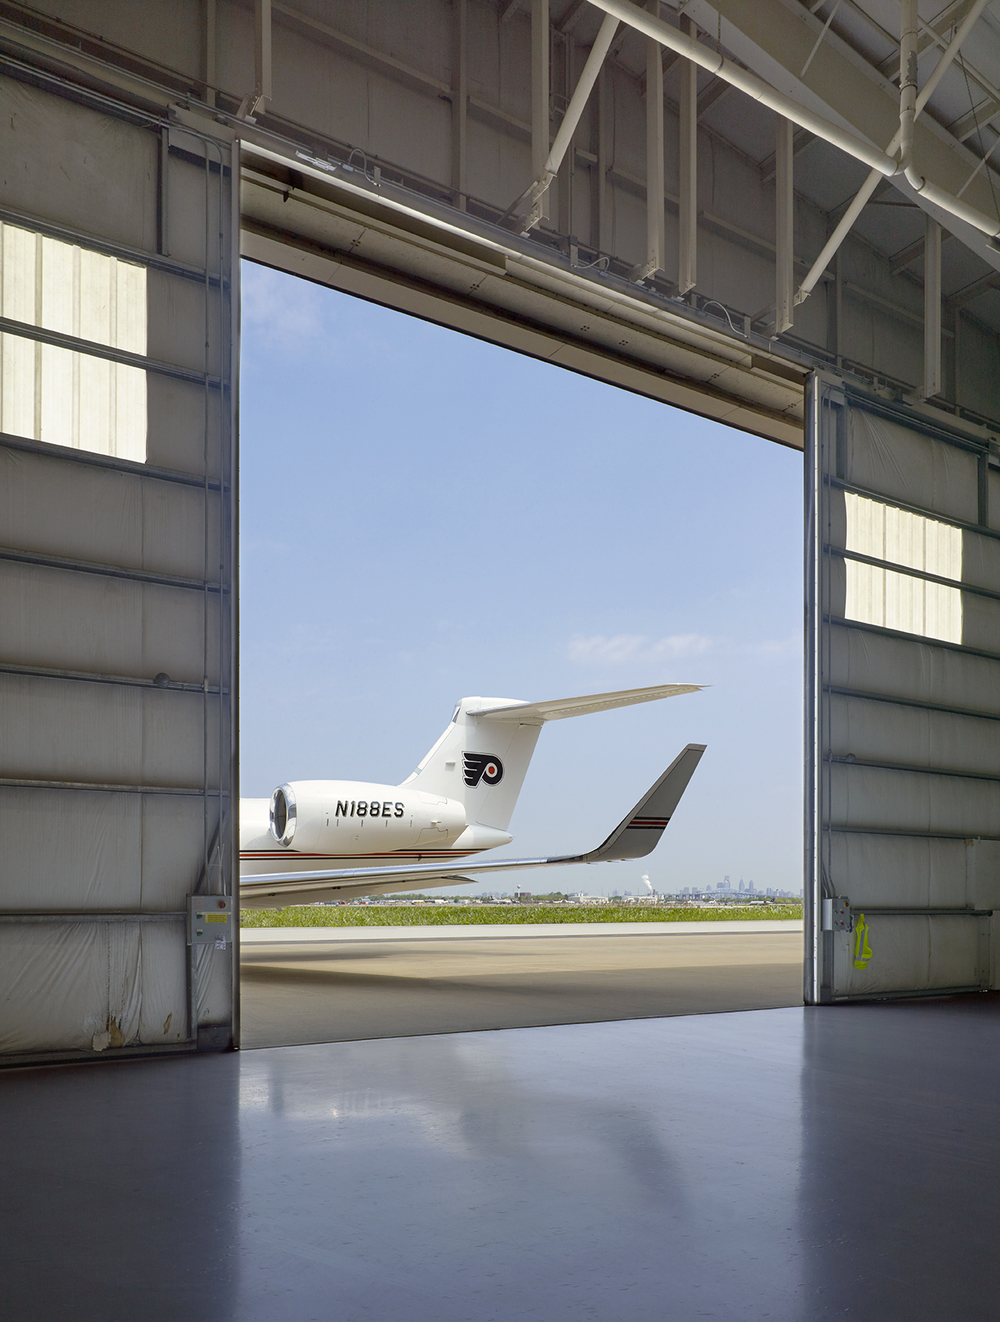 Flyers Plane_1.jpg